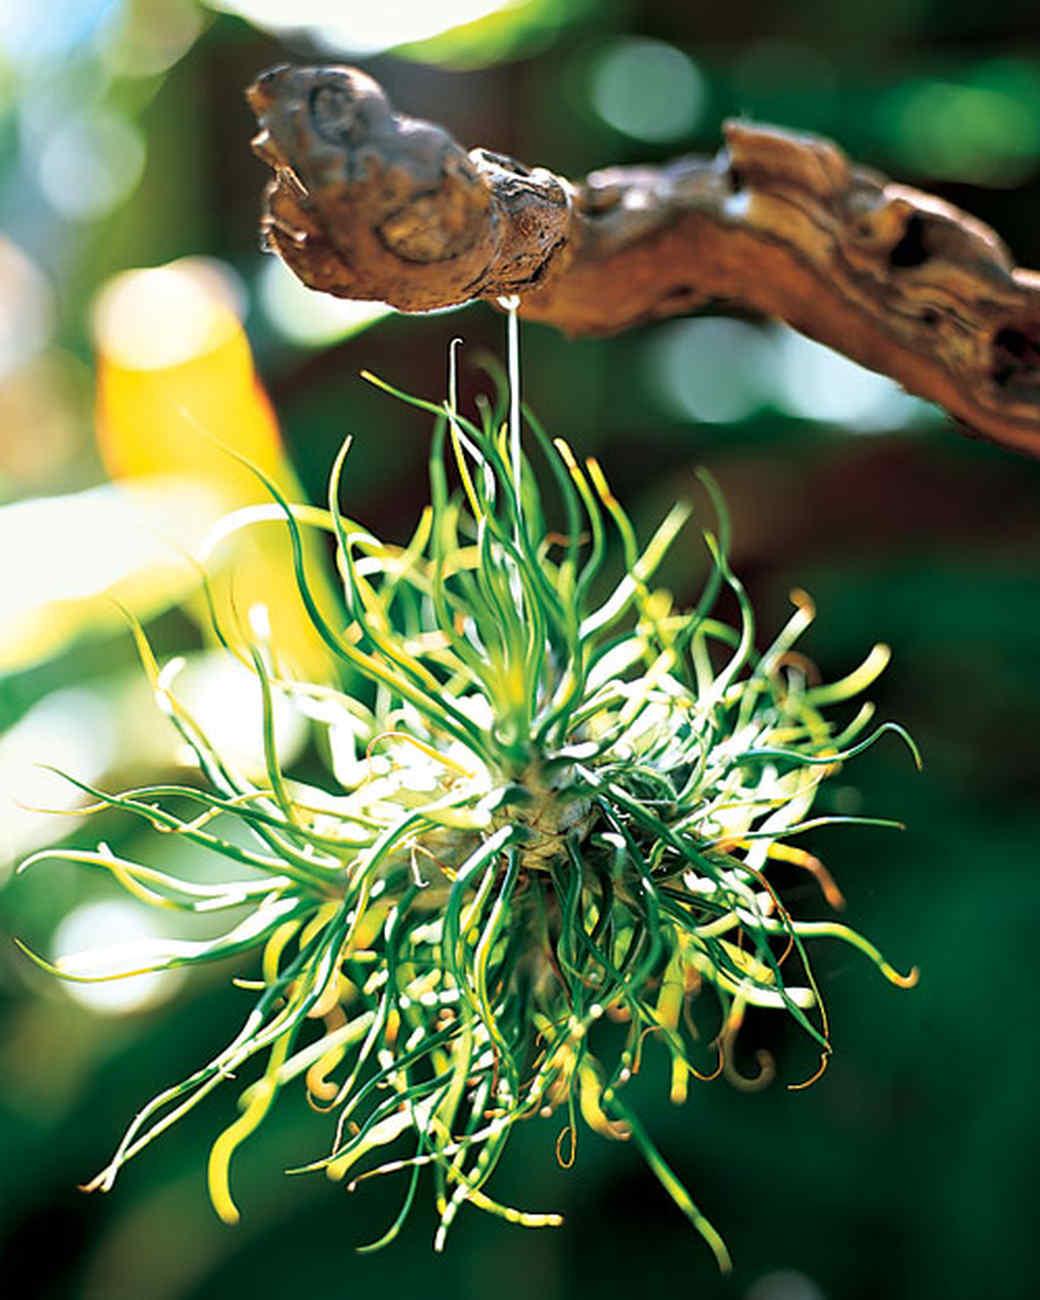 mla10351_sept2008_branchplant1.jpg